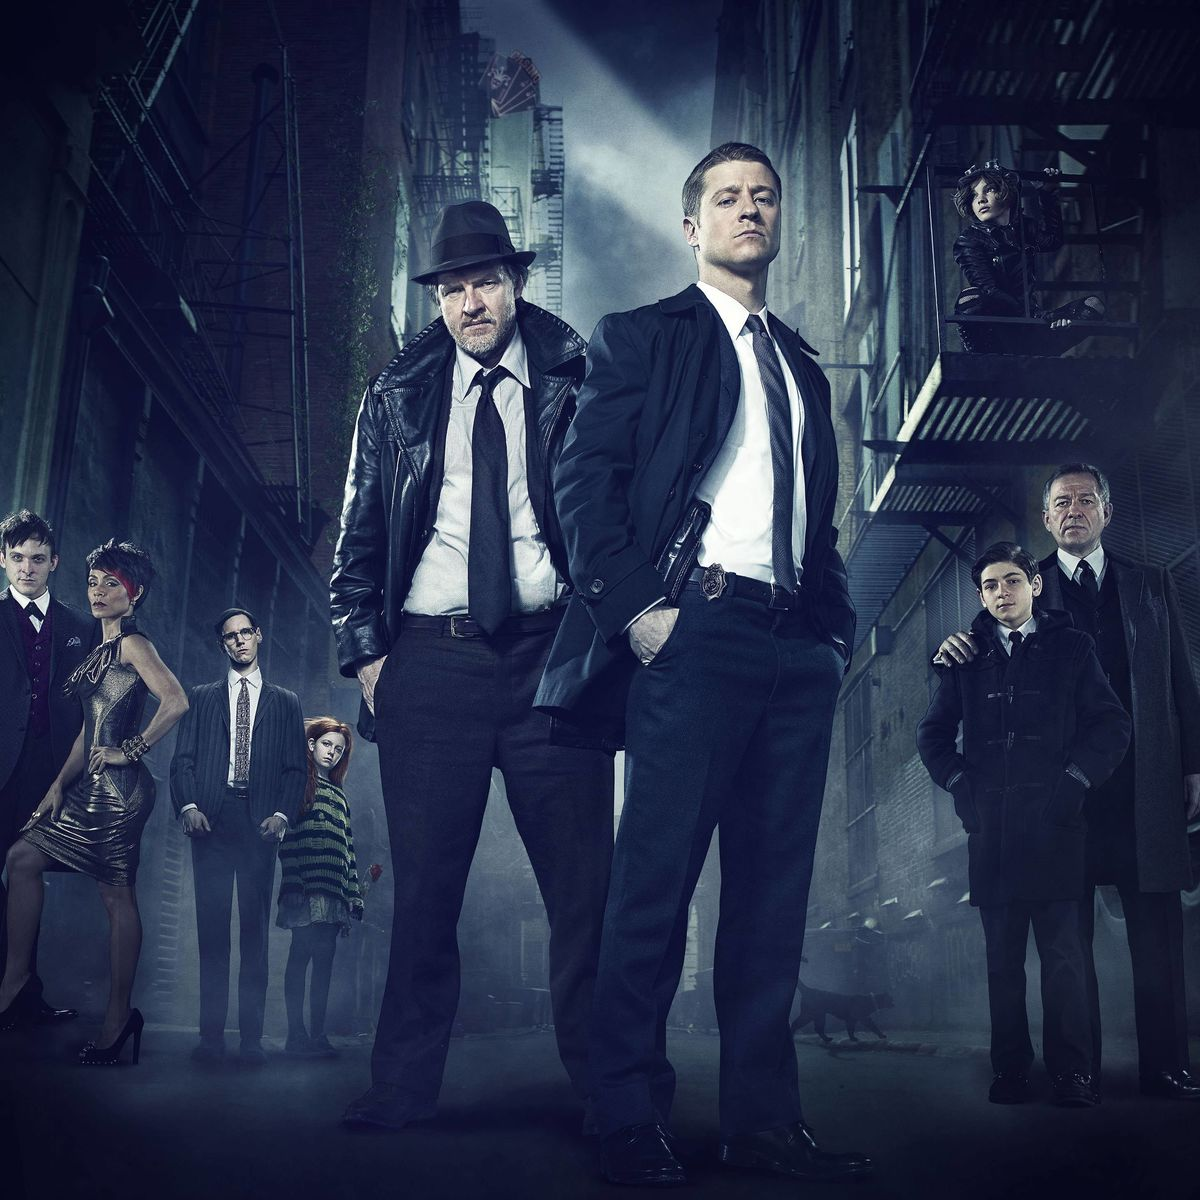 GothamCharacters1.jpg